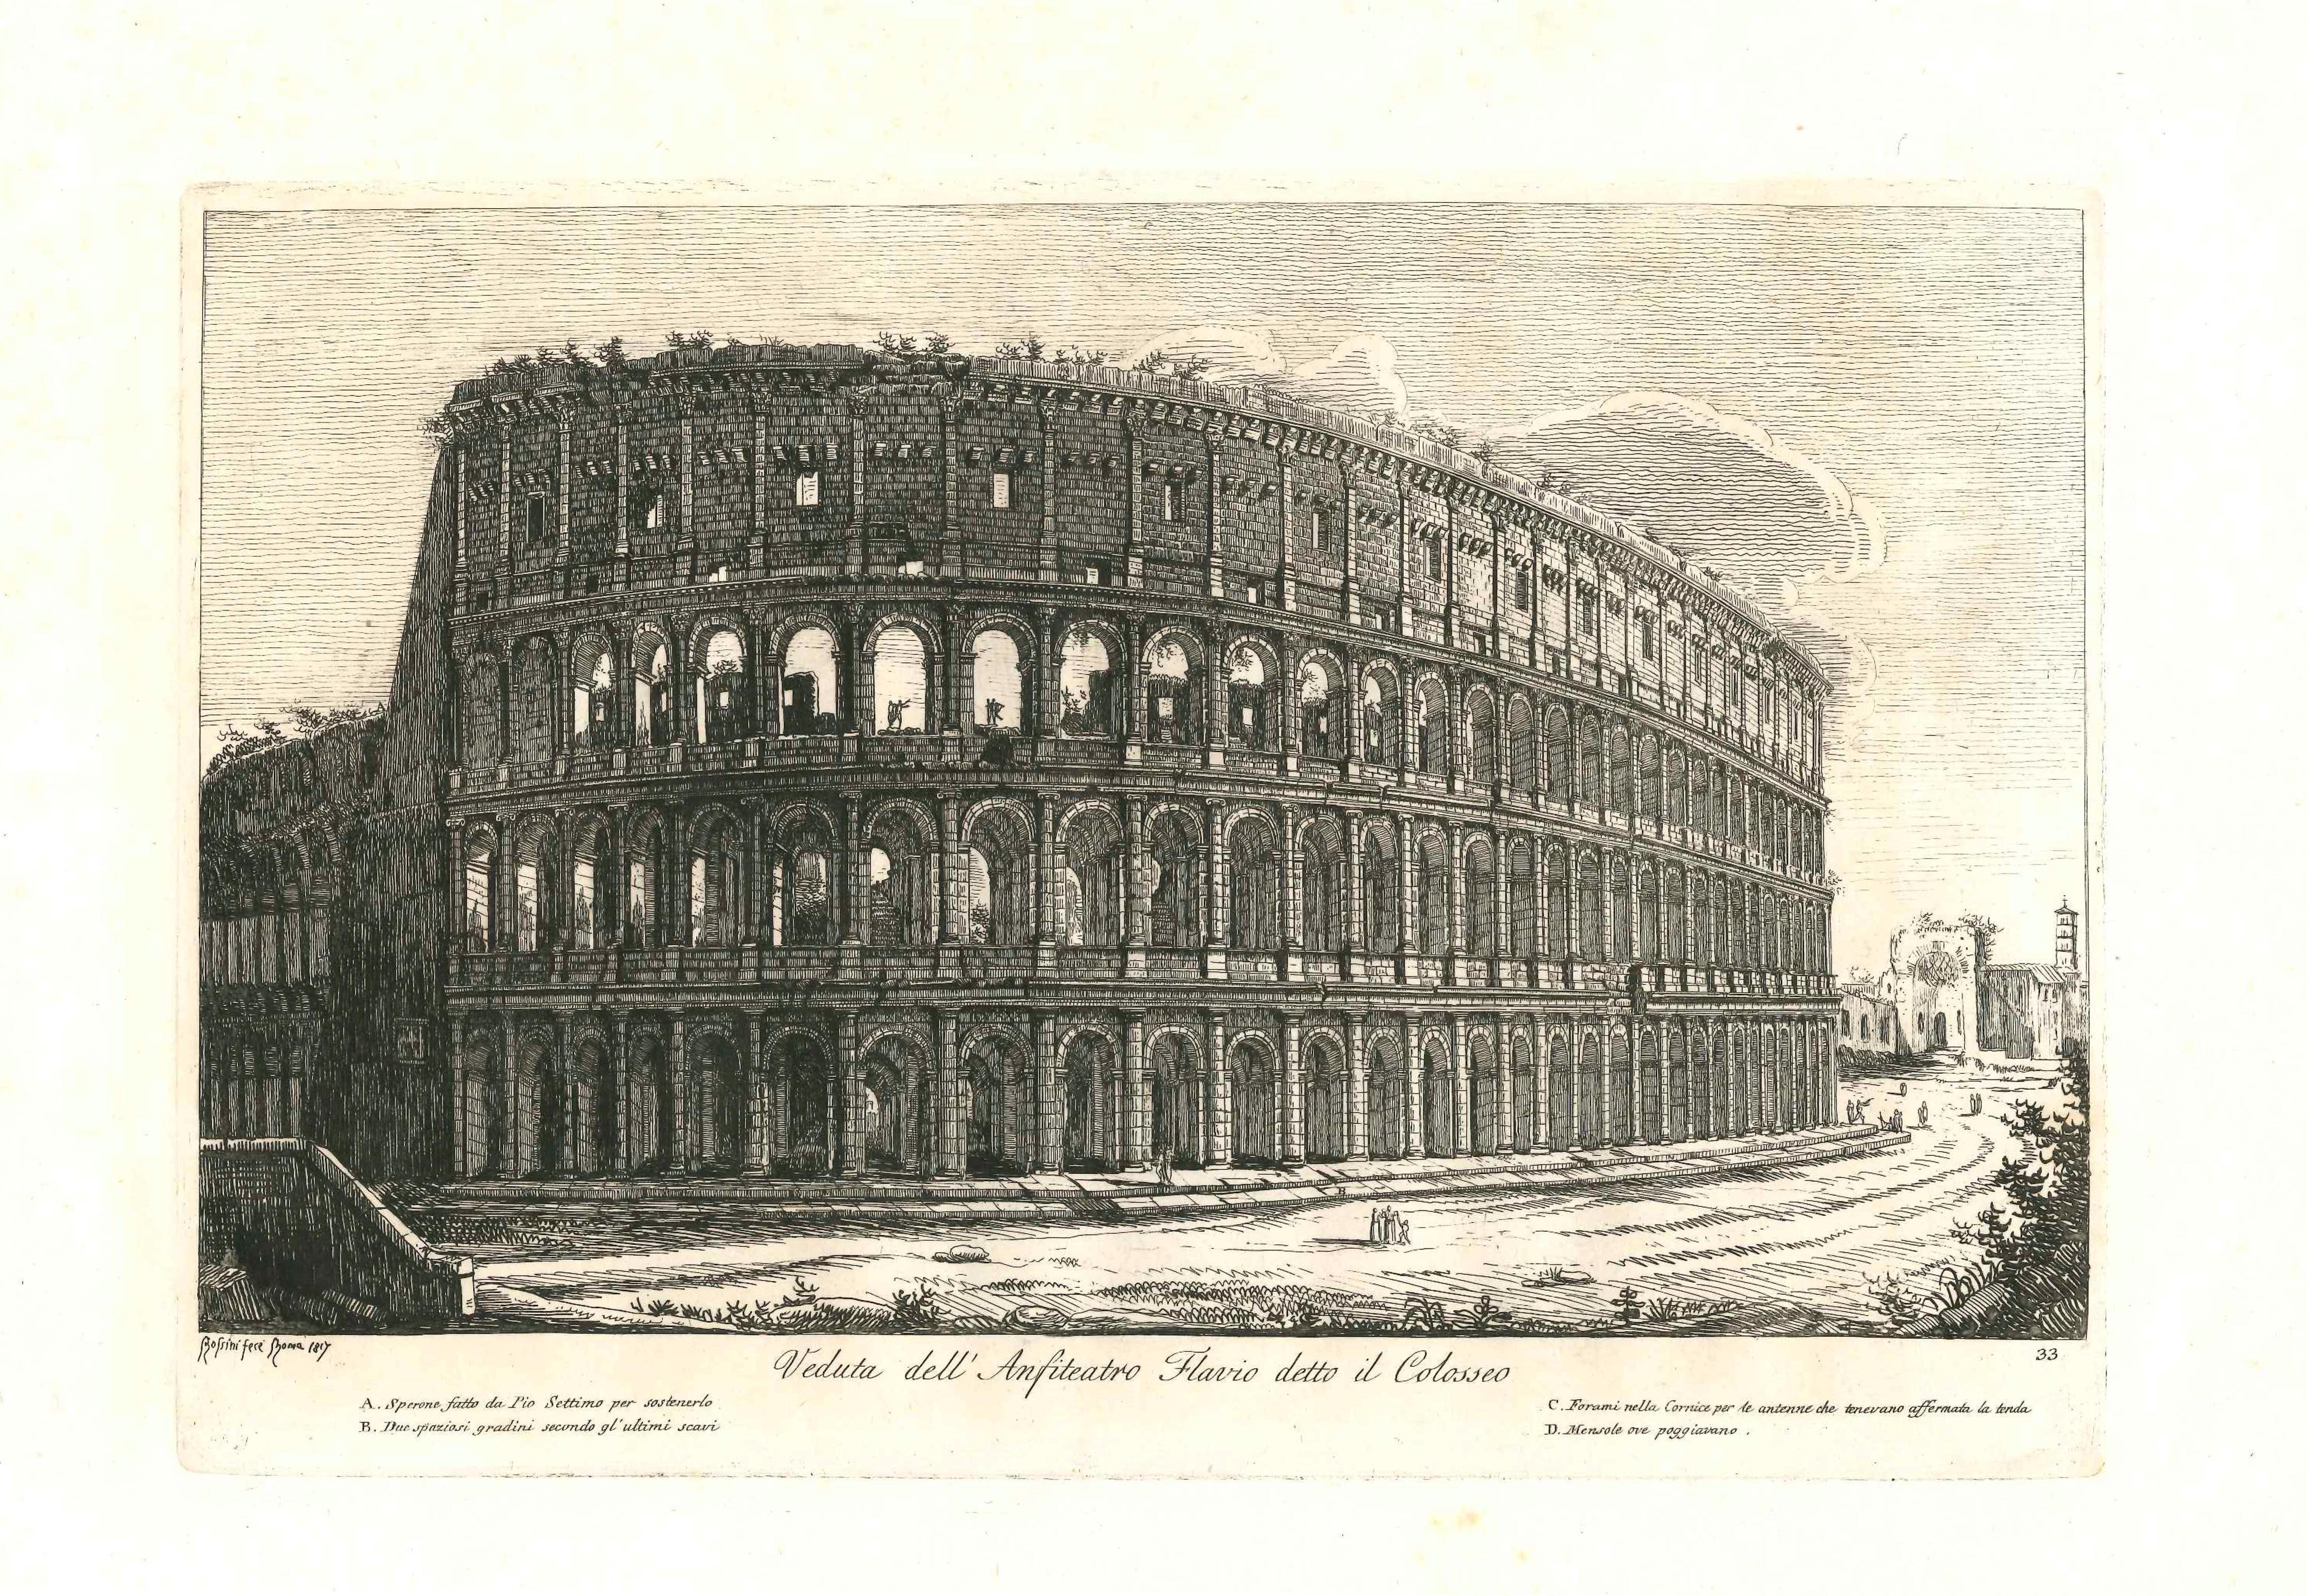 1800 Colosseum Landscape Realist in Rome Engraving Luigi Rossini on Paper